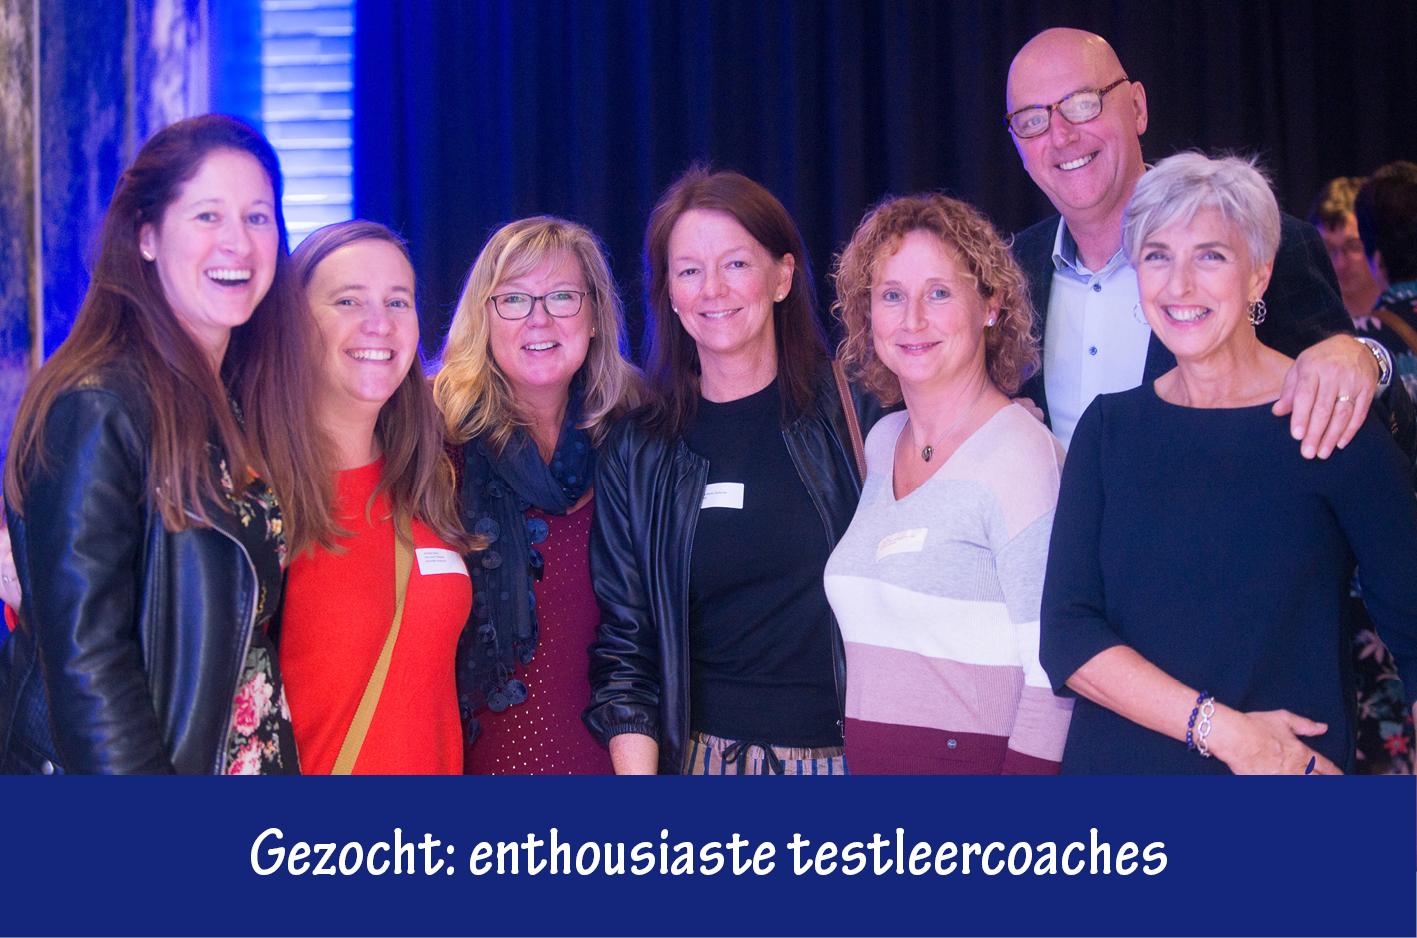 Gezocht: enthousiaste testleercoaches derde jaar secundair